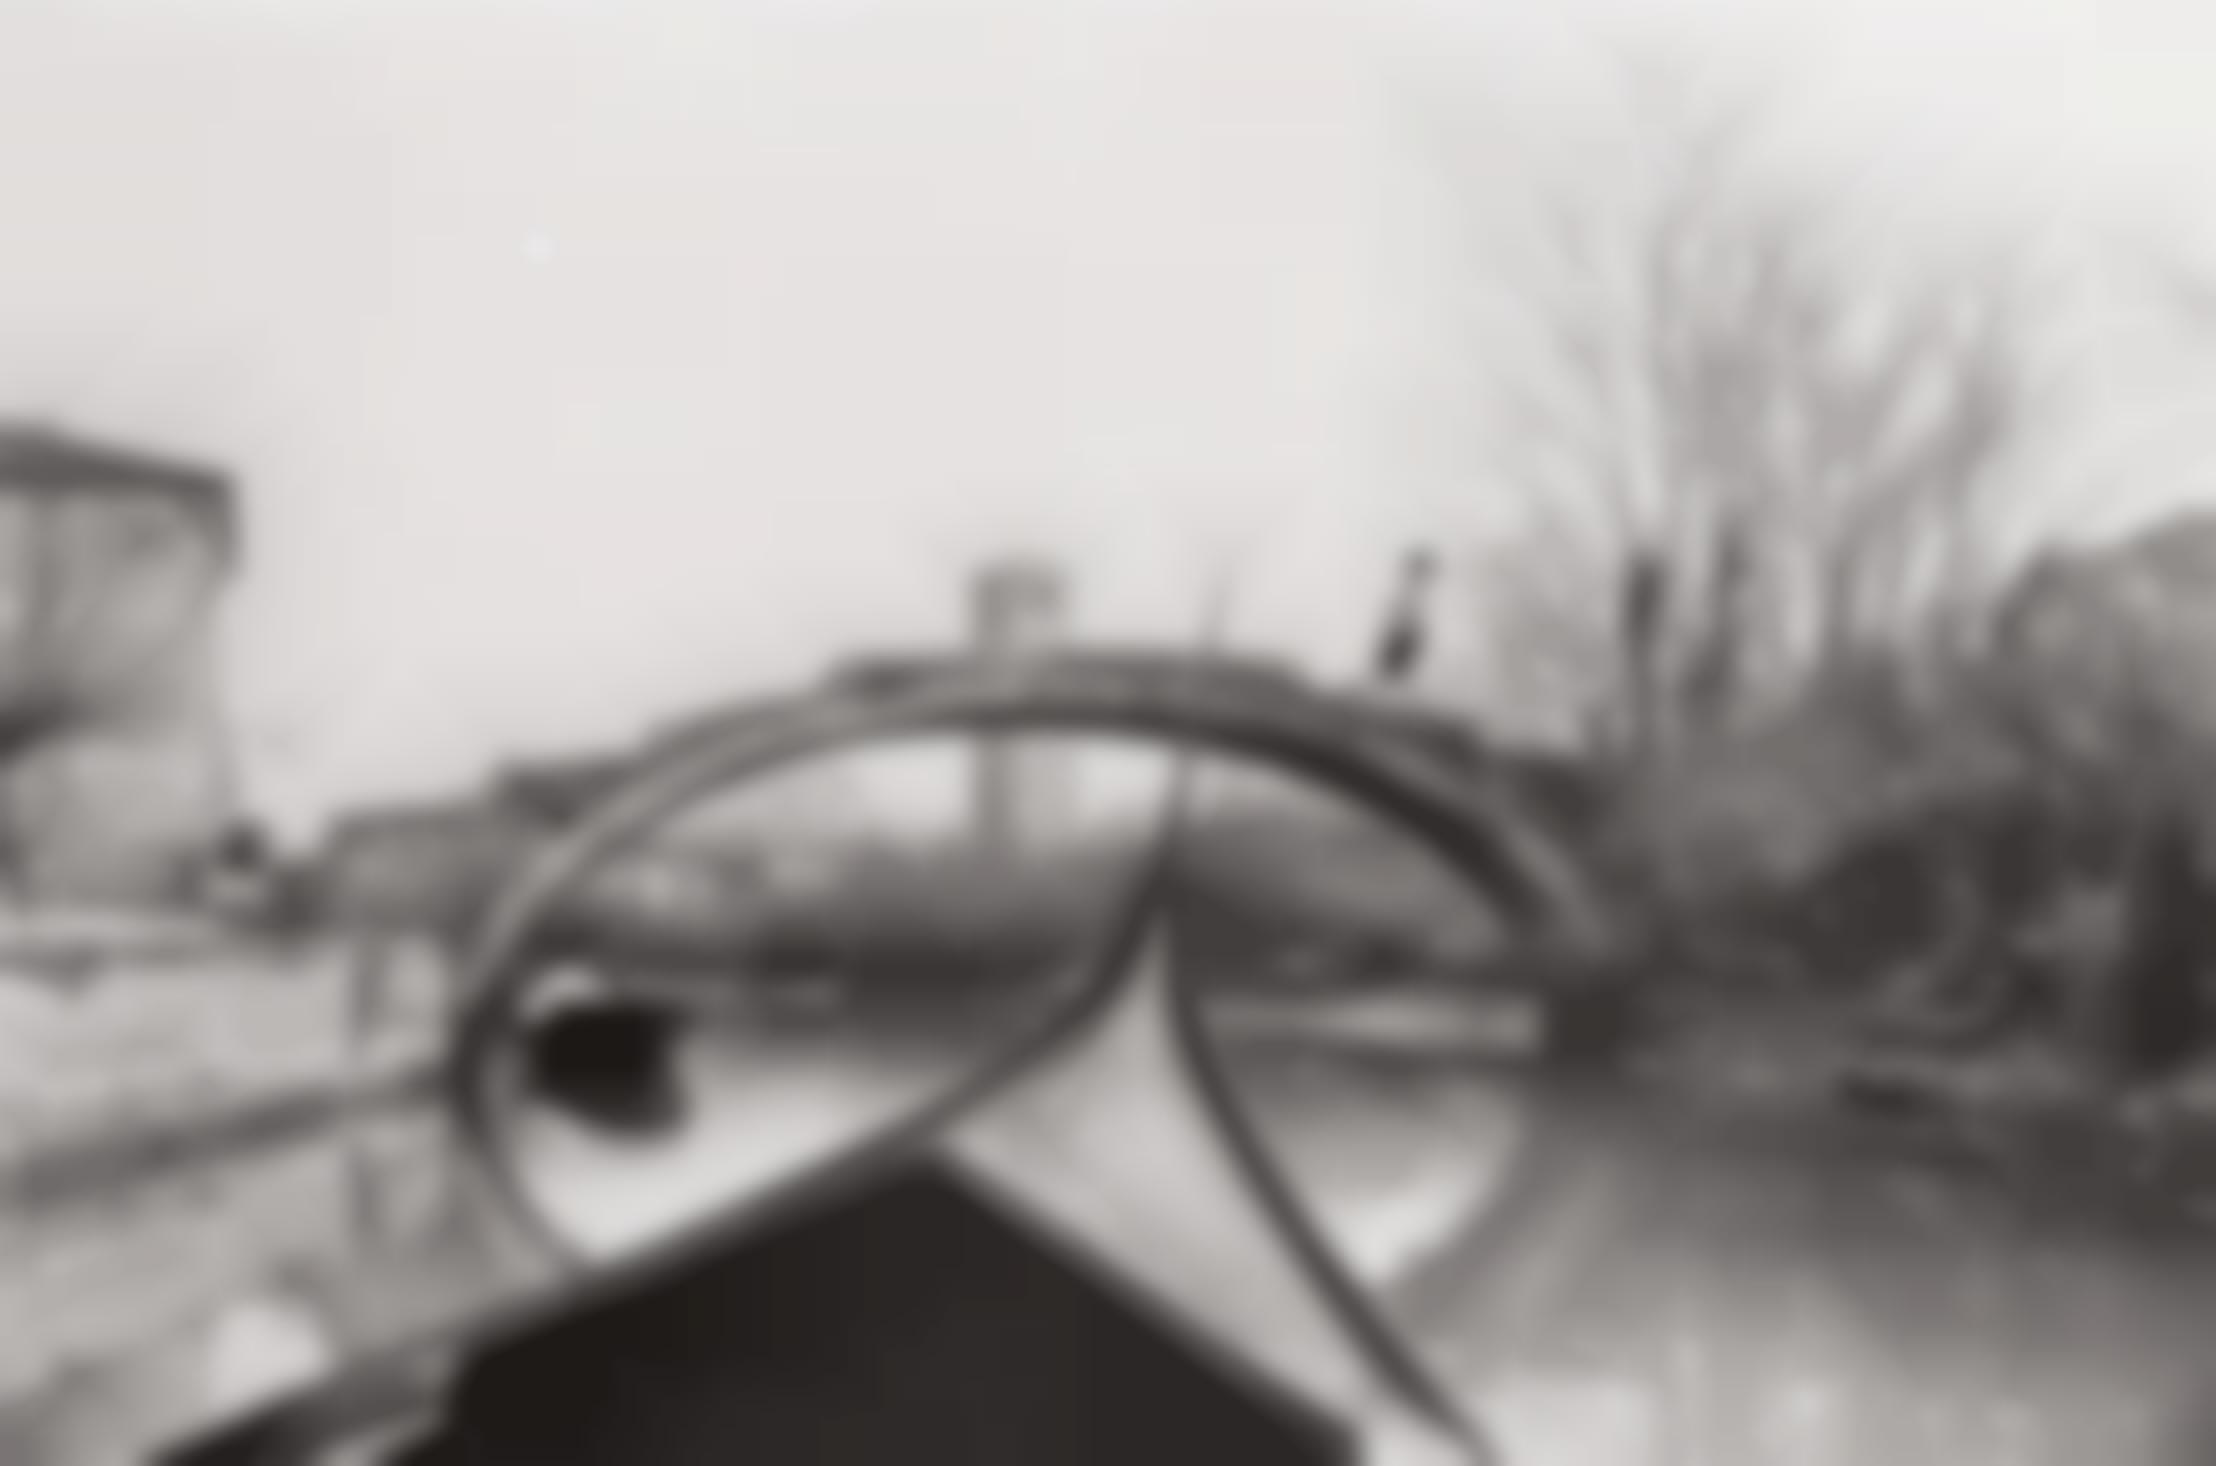 Henri Cartier-Bresson-Torcello In The Venetian Lagoon, Italy-1953